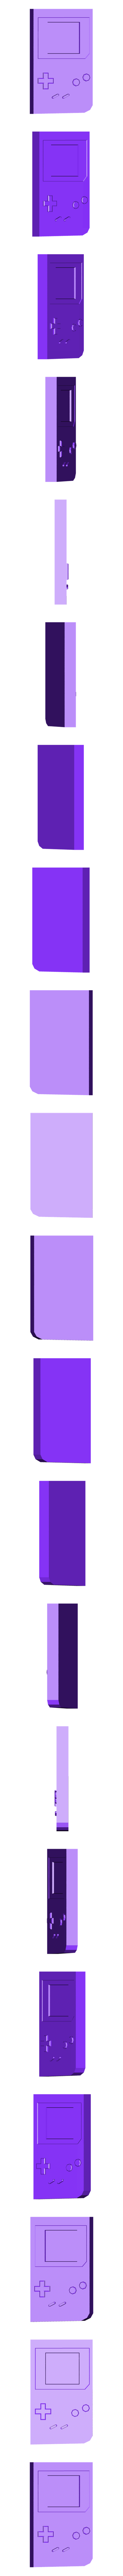 1642e360 fb16 437b a154 c5ac10fcd479